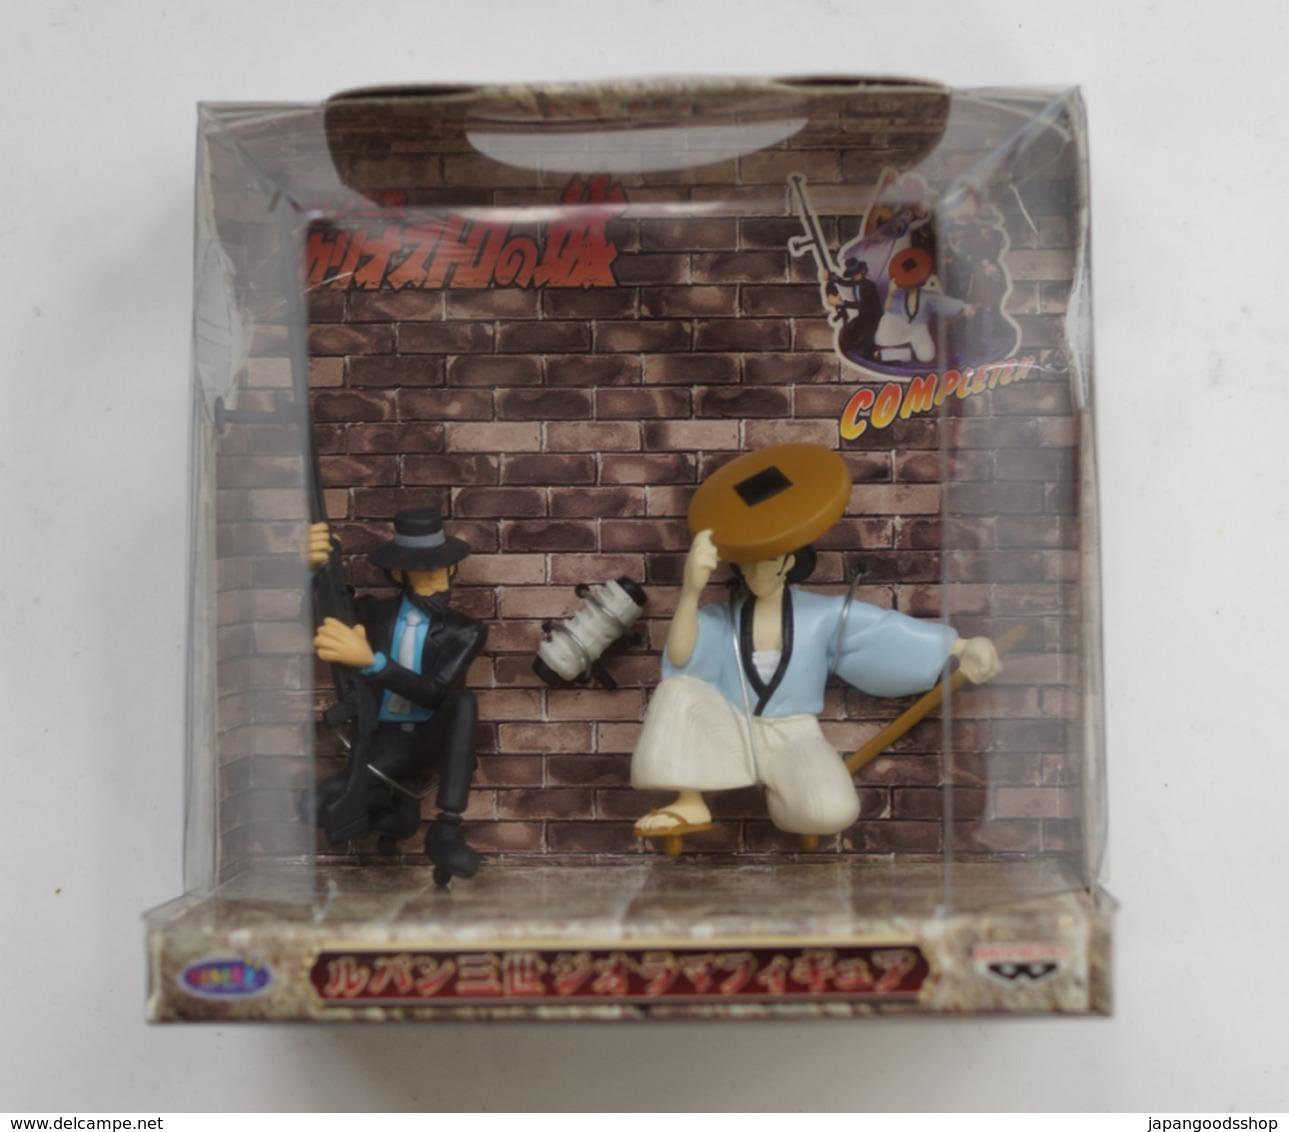 Figurine : Lupin The 3rd   ( Banpresto ) - Figurines